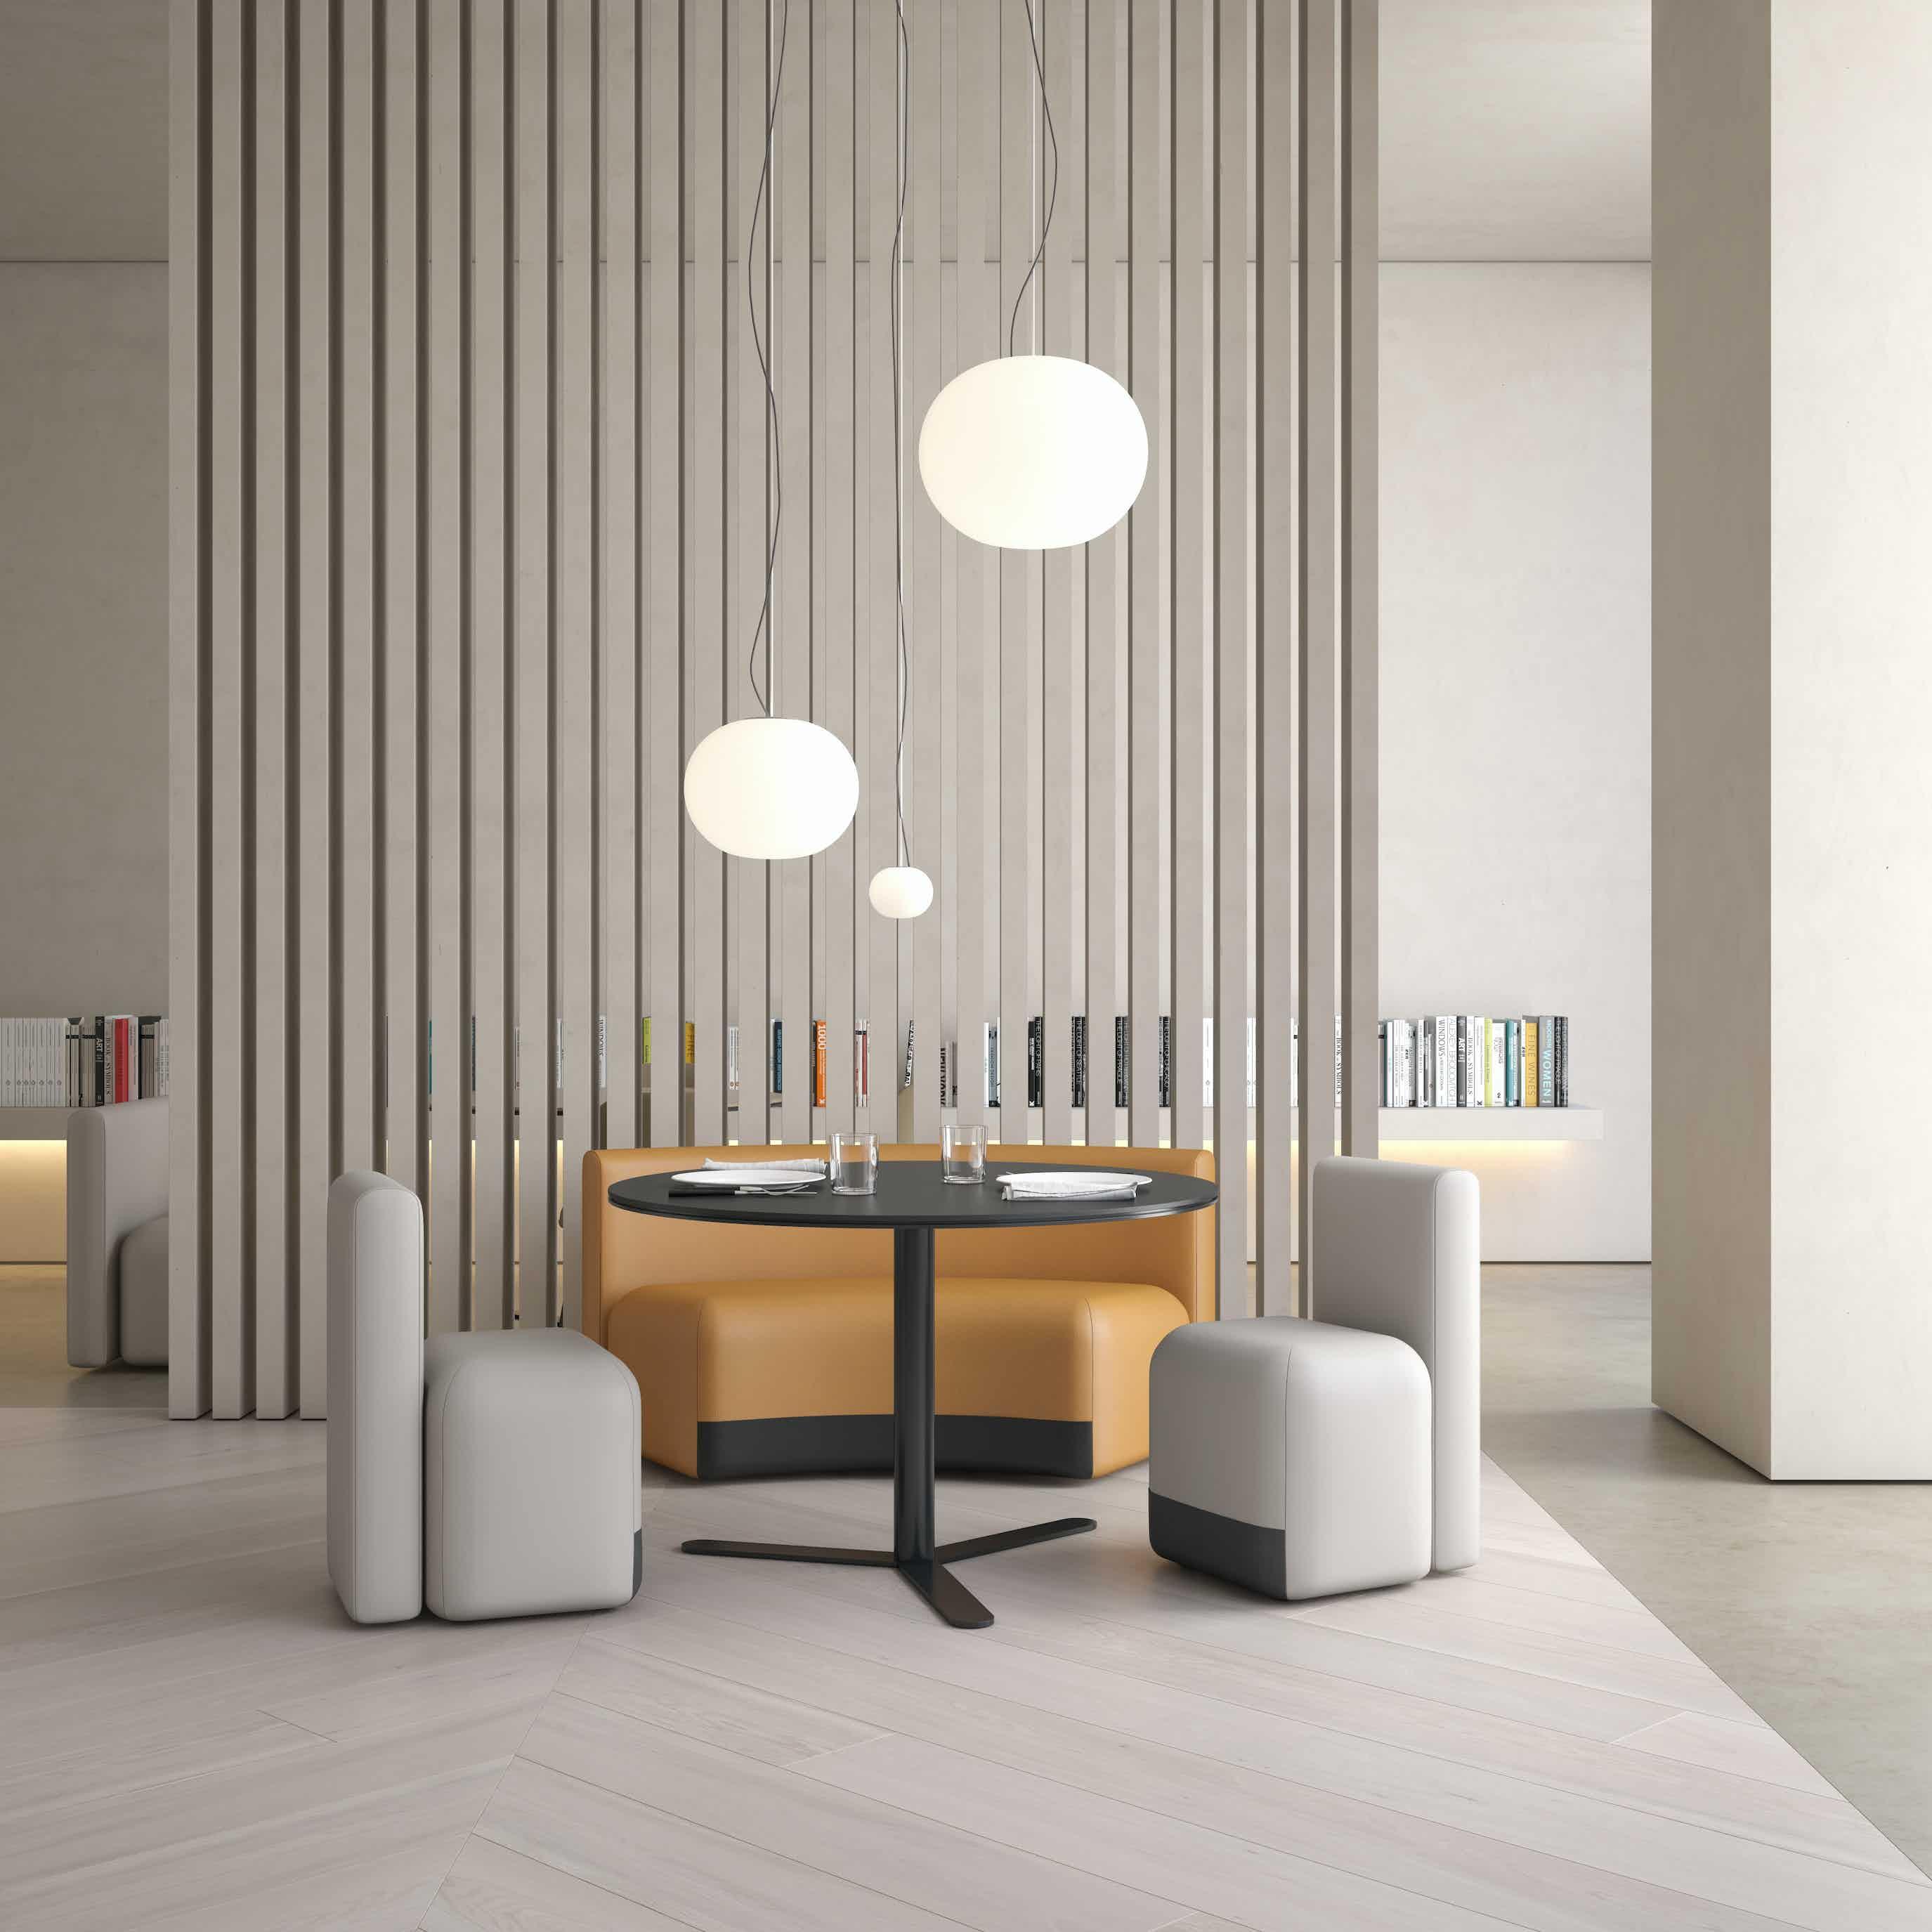 Viccarbe-dining-season-chair-institu-haute-living